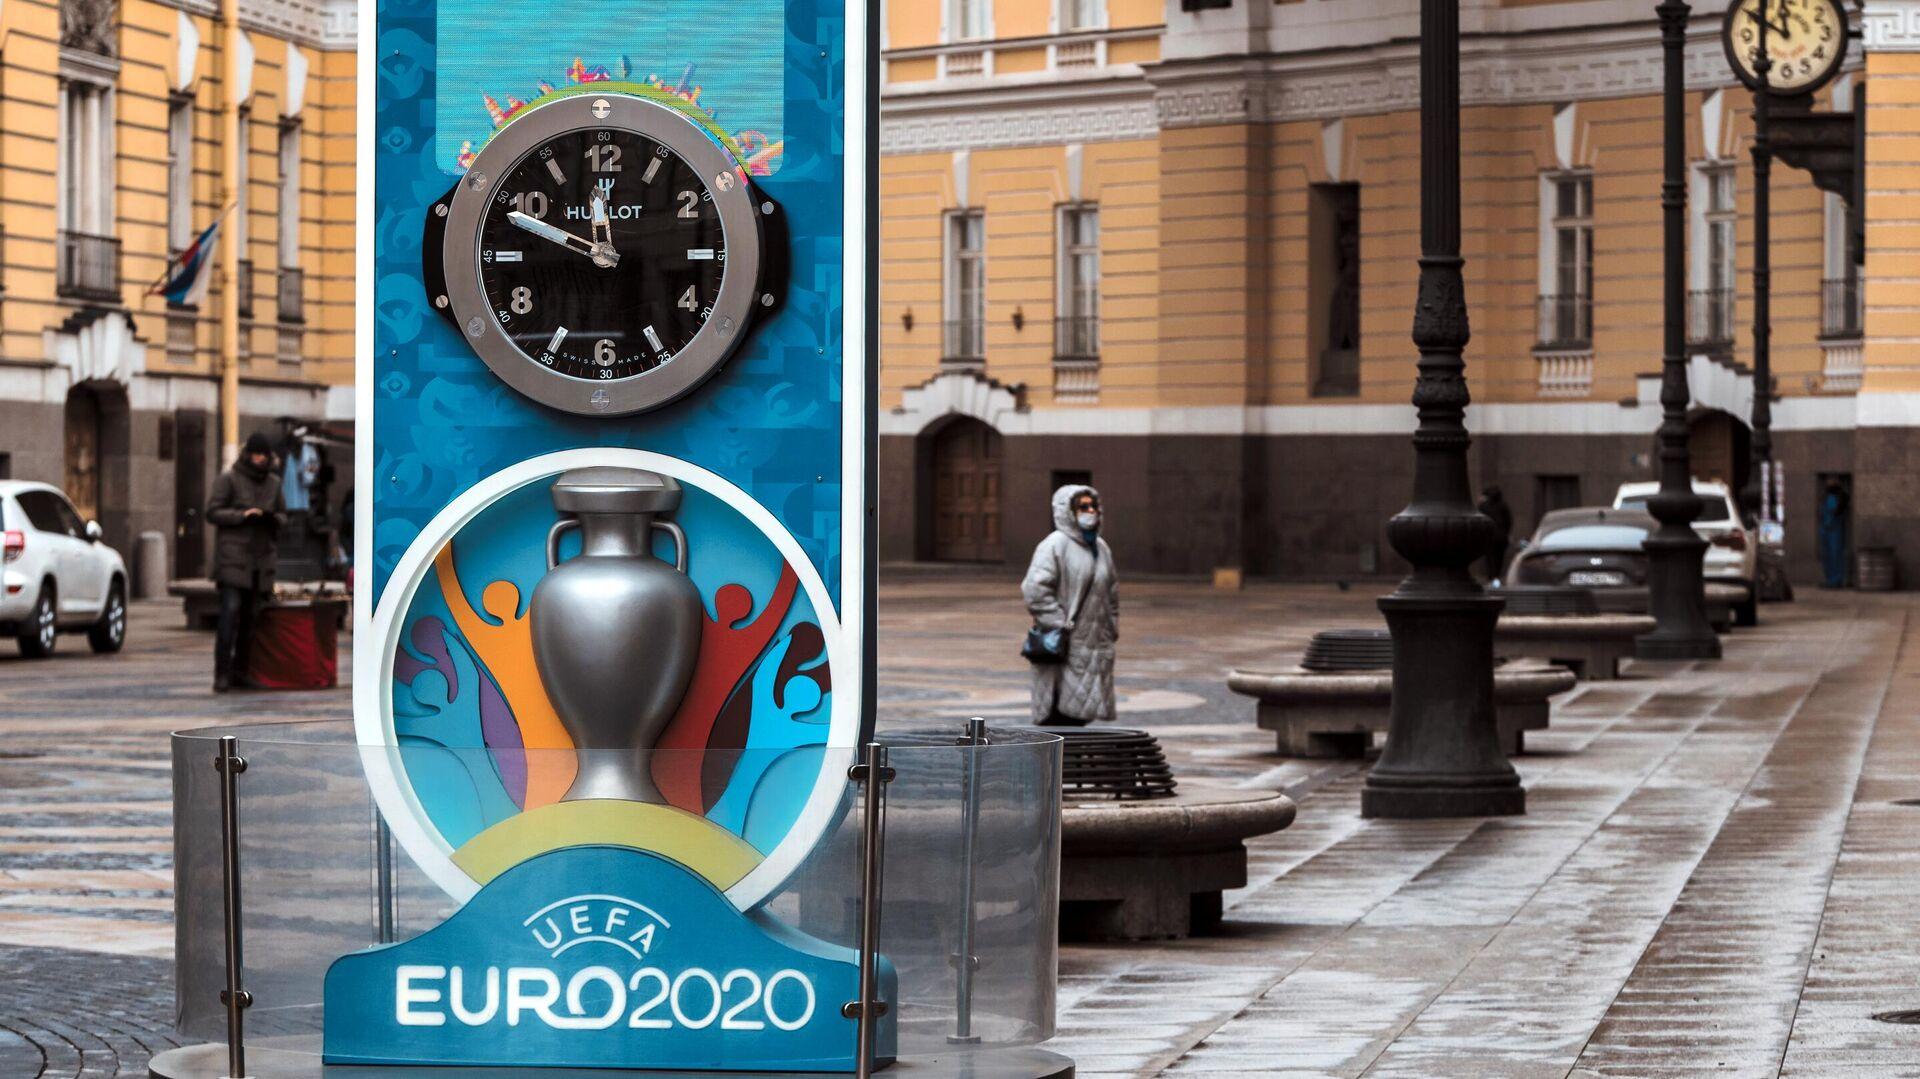 Евро-2020 - РИА Новости, 1920, 11.06.2021